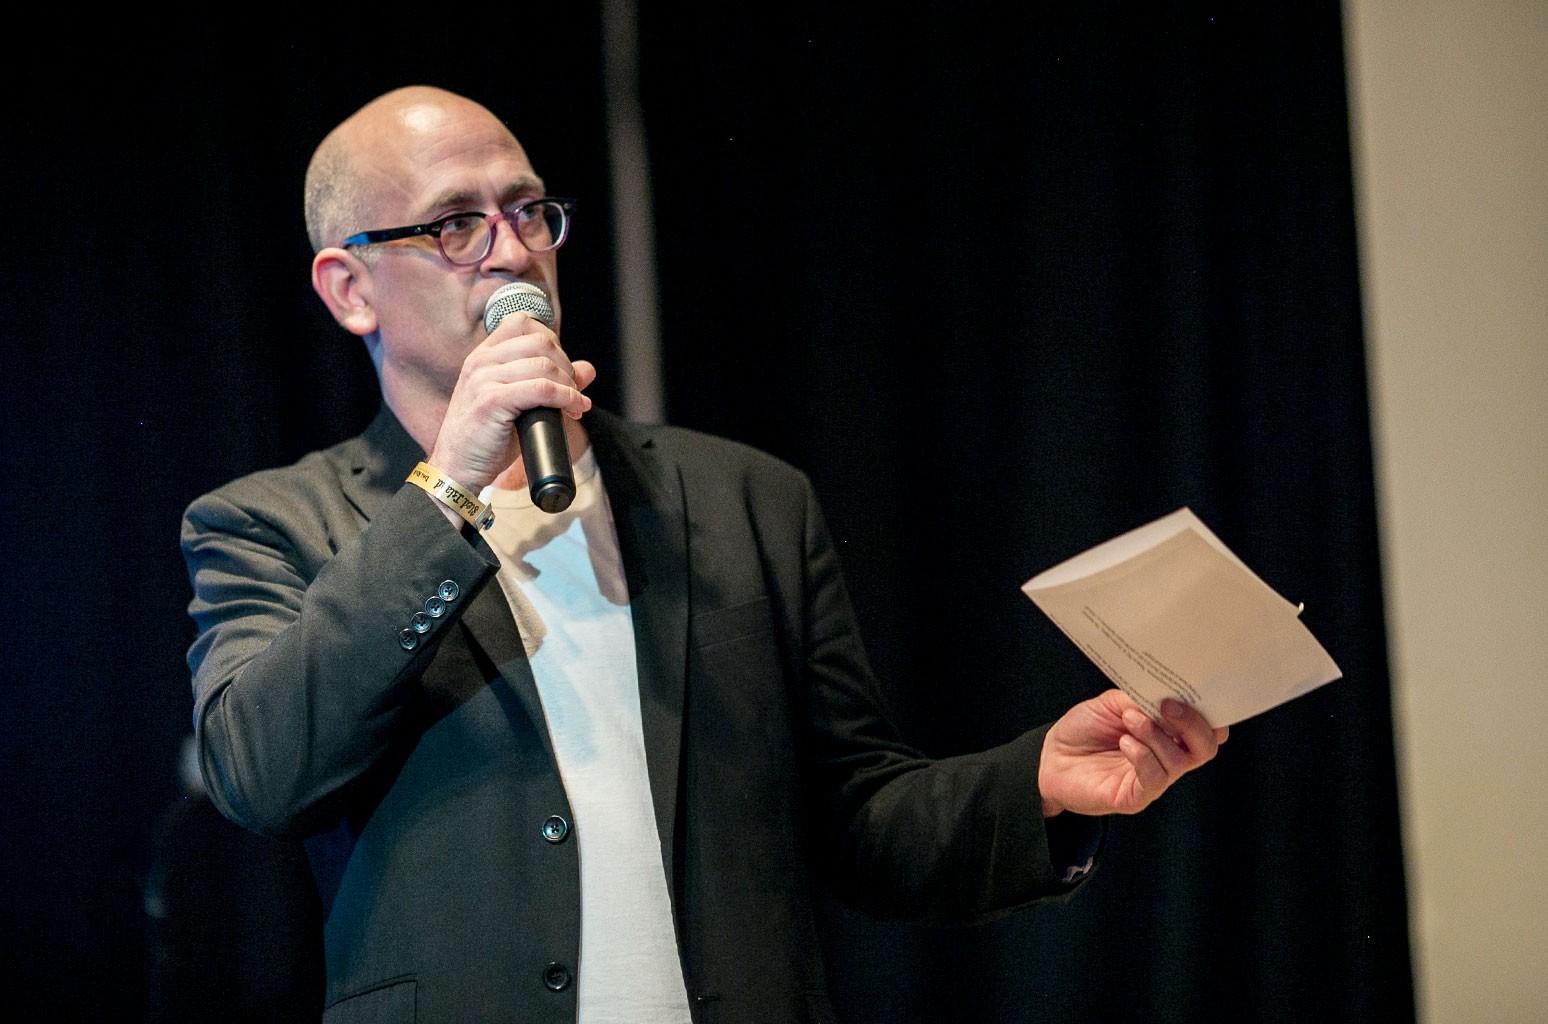 Polaris founder Steve Jordan speaks at the announcement of the Polaris Music Prize long list on June 19, 2014 in Calgary, Canada.